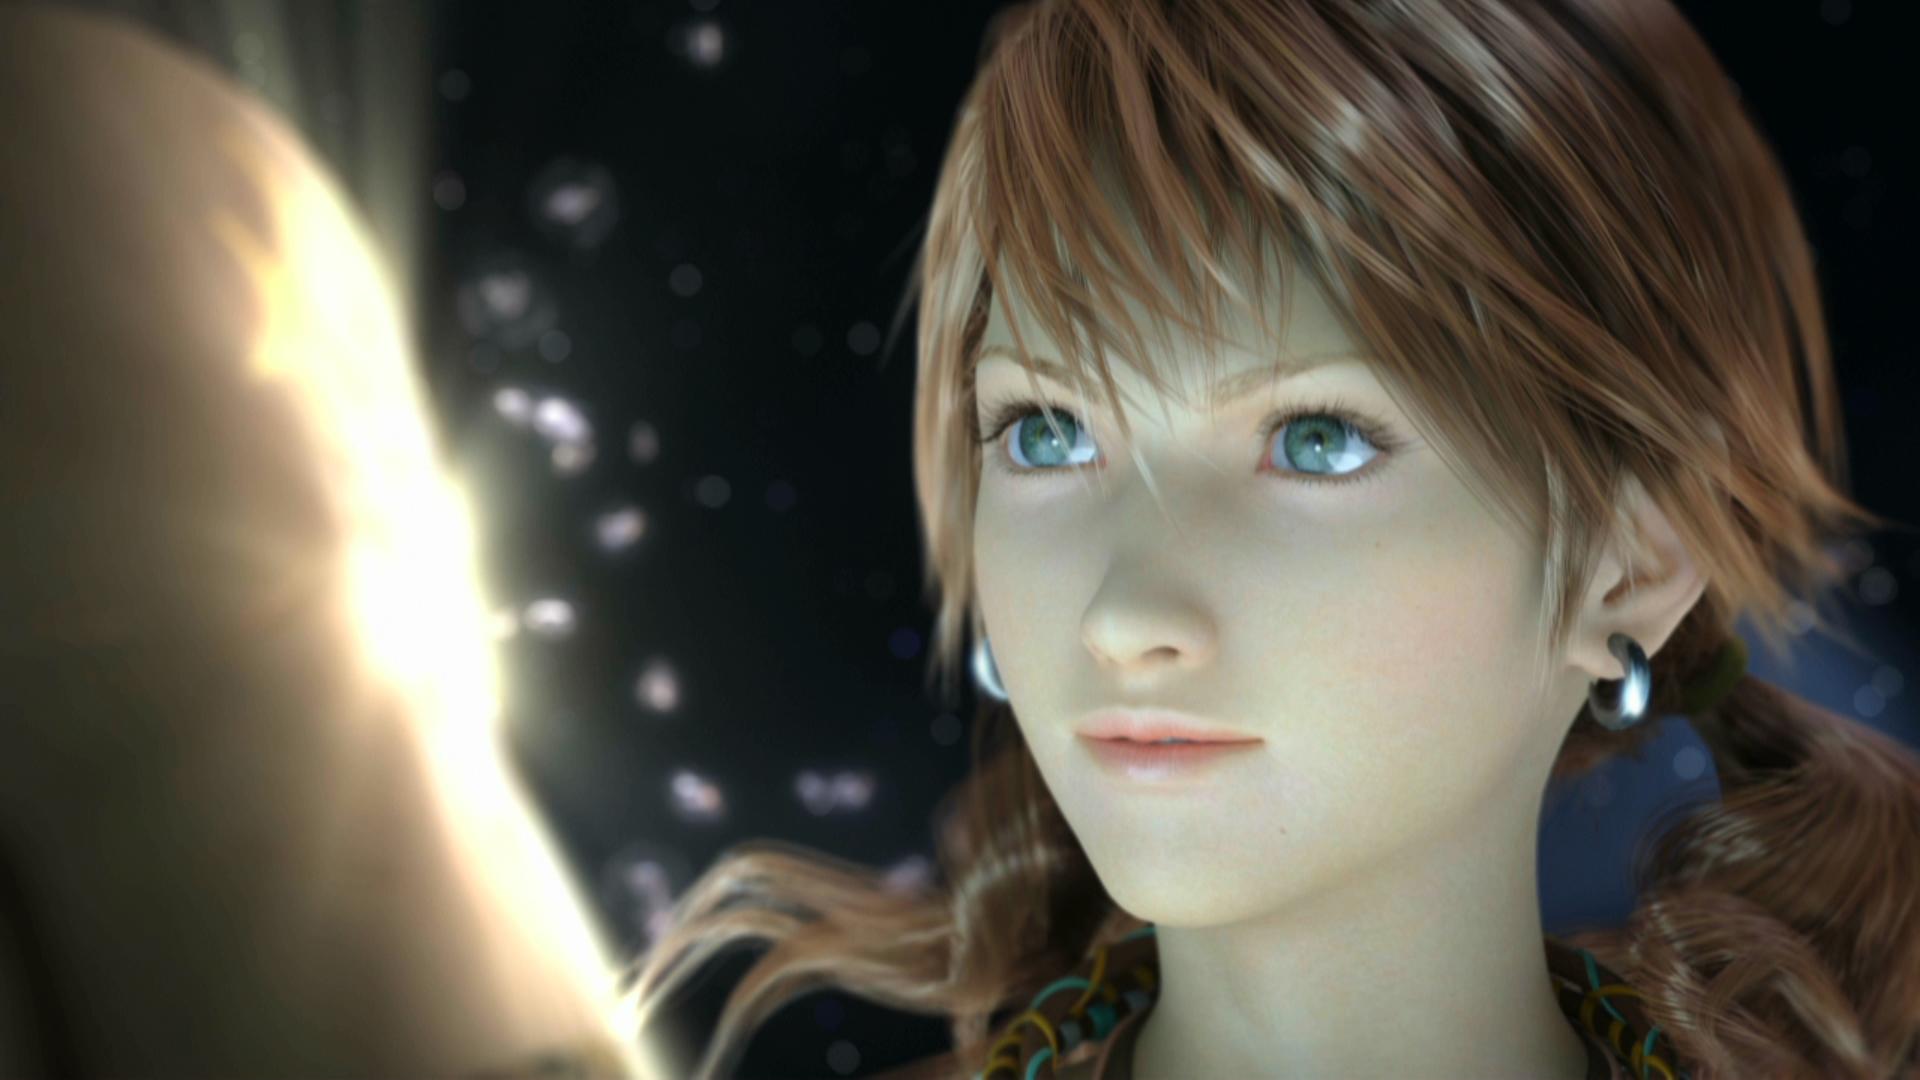 Ultra realistic cgi anime girl exposed photo